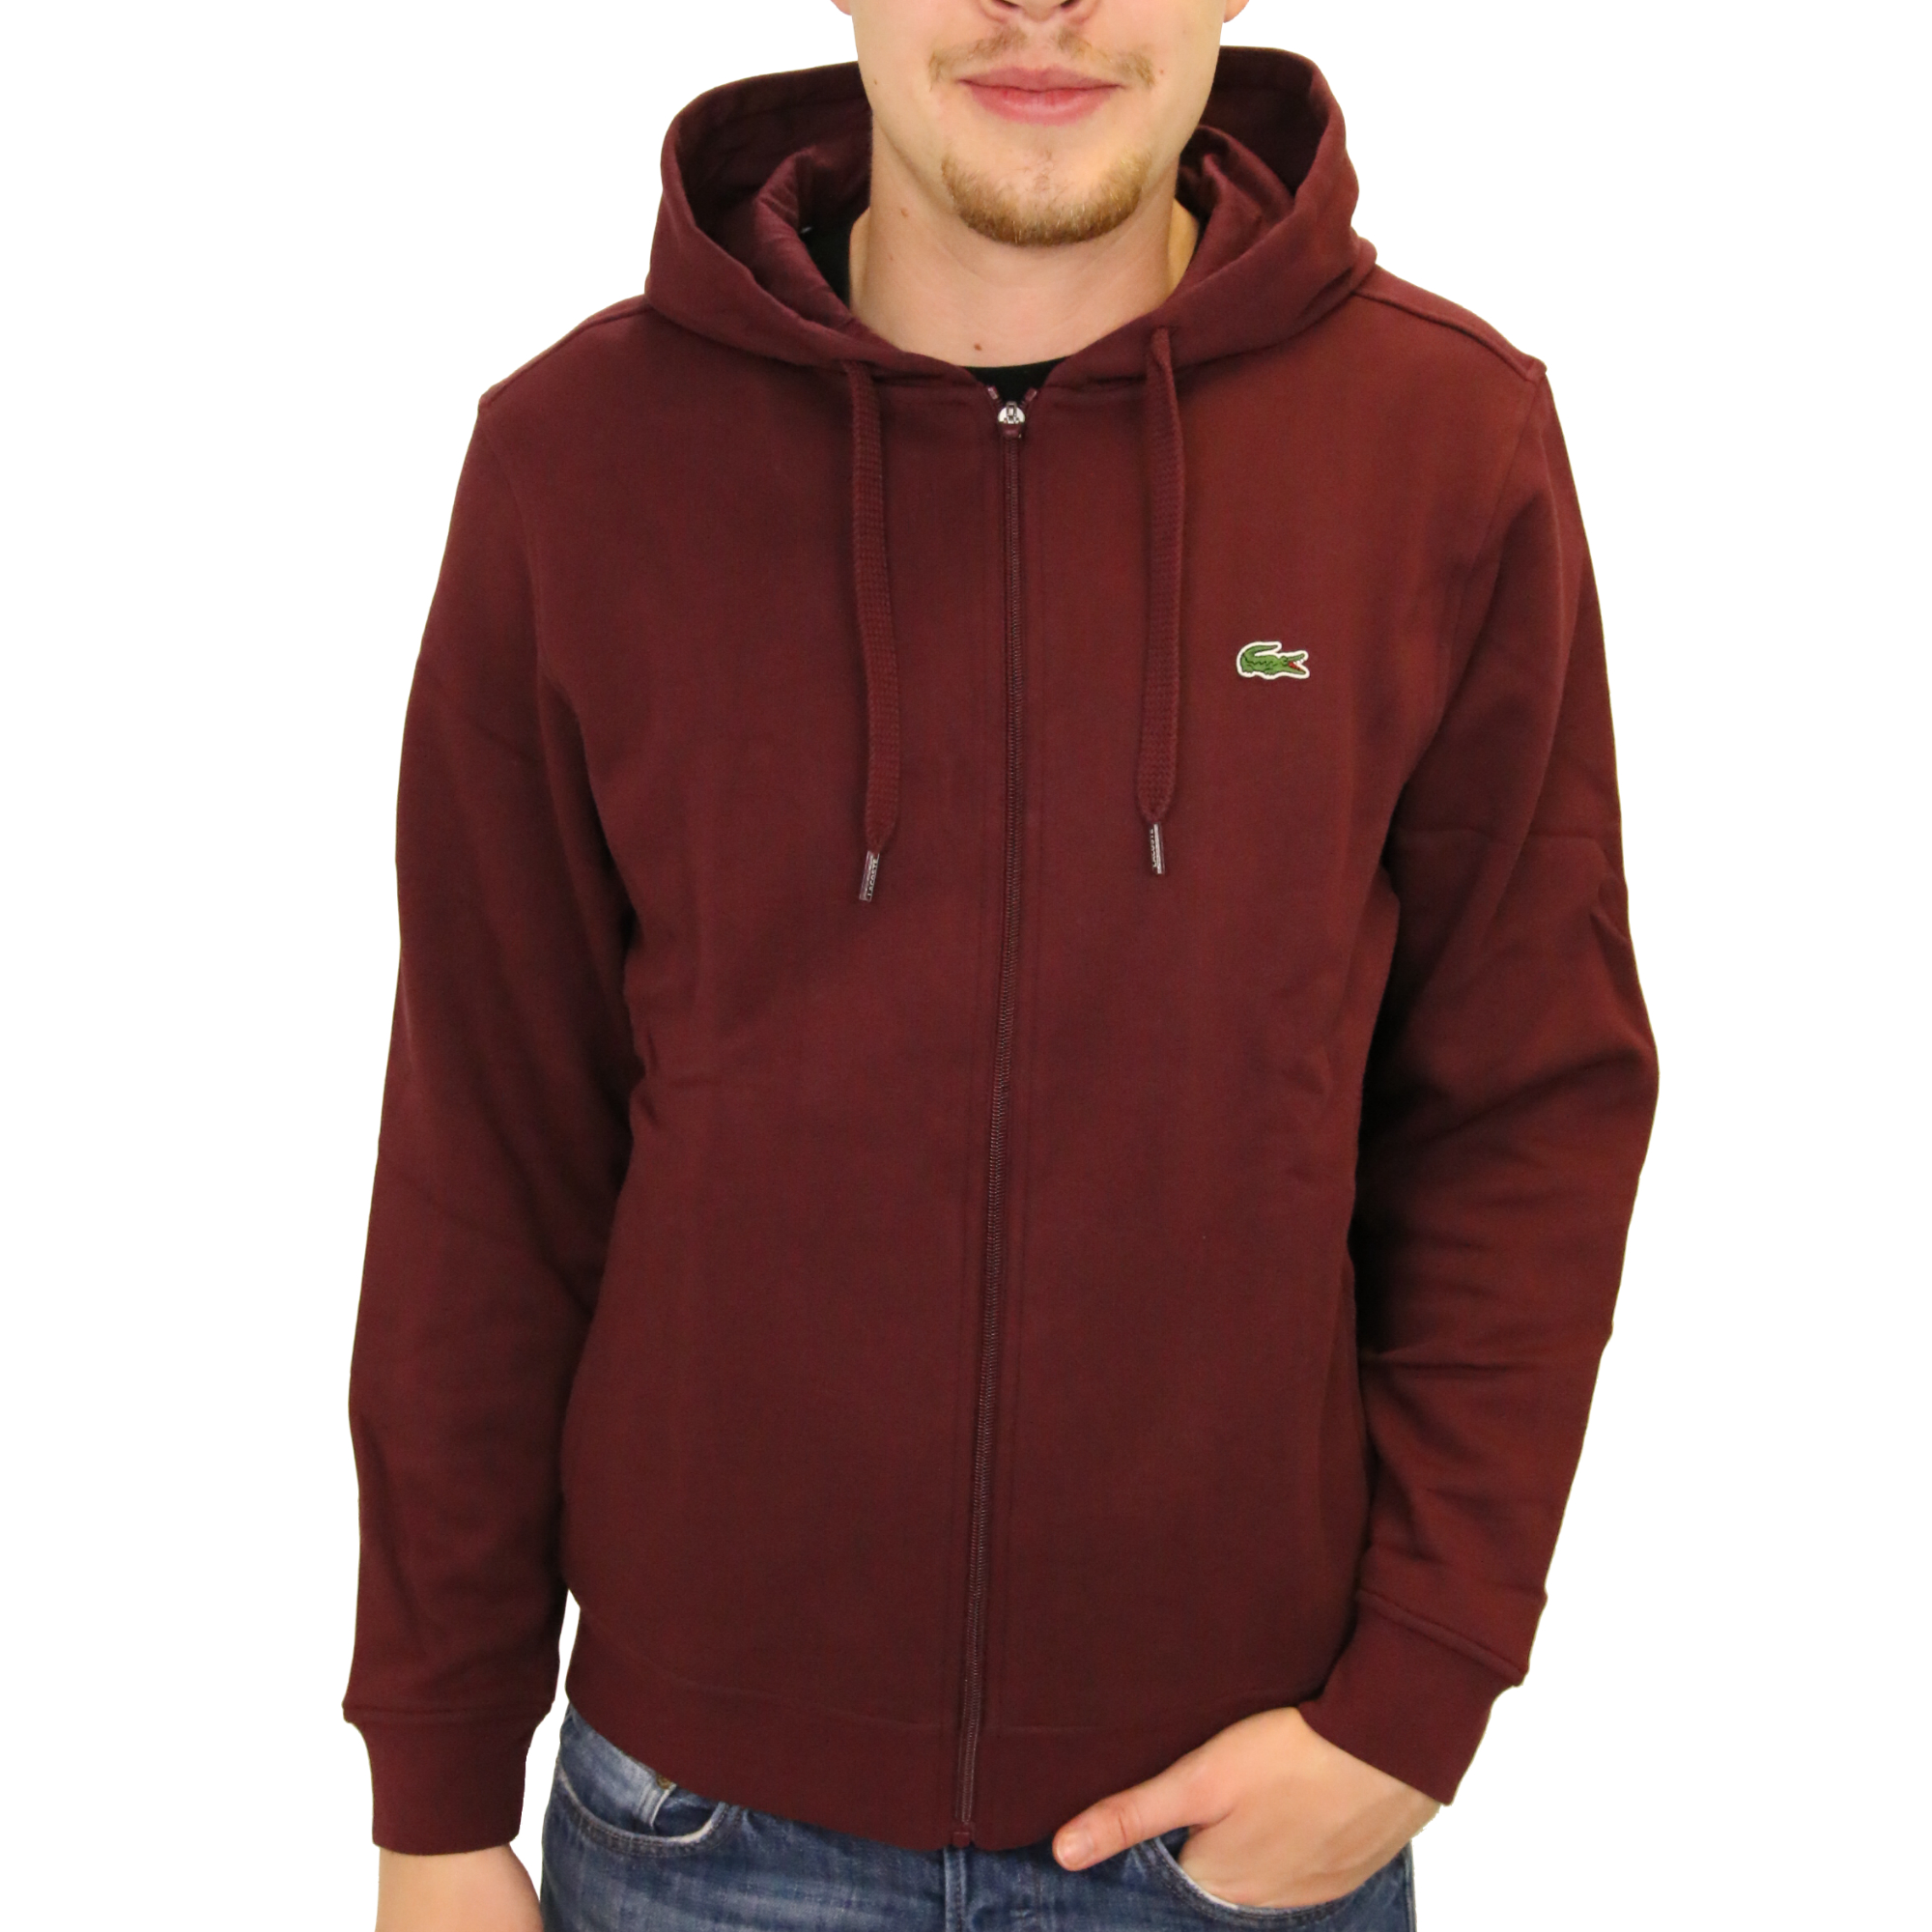 lacoste kapuzen sweatshirt jacke kapuzenjacke hoodie sweatshirtjacke herren. Black Bedroom Furniture Sets. Home Design Ideas